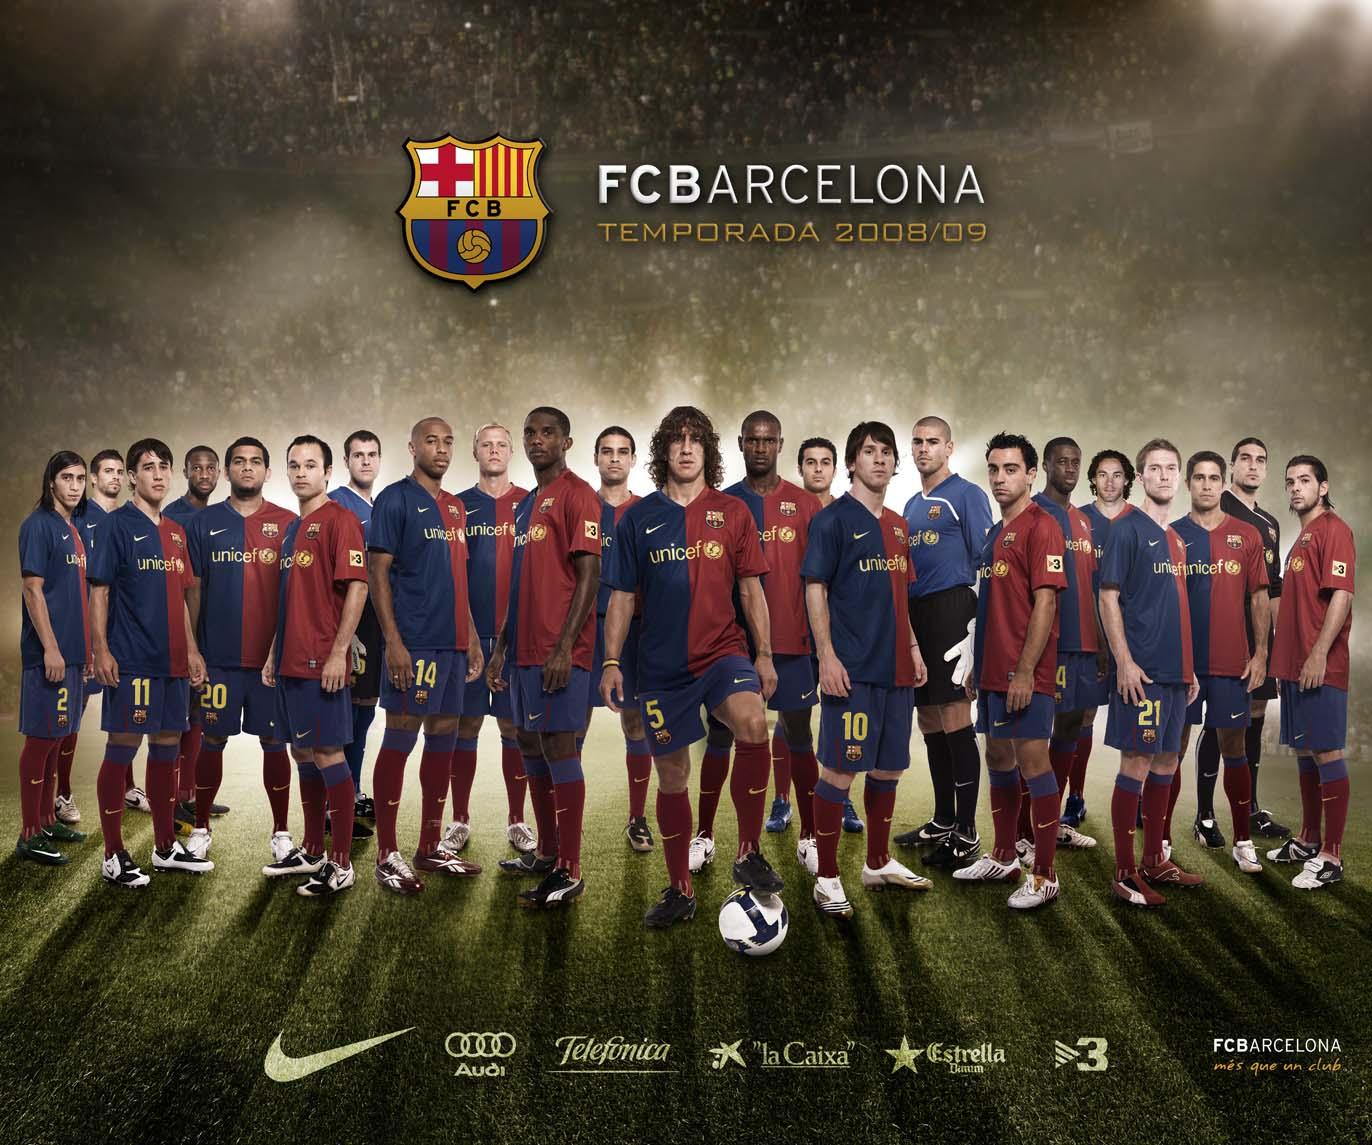 [Fans Club] Barcelona FCBarcelona0809